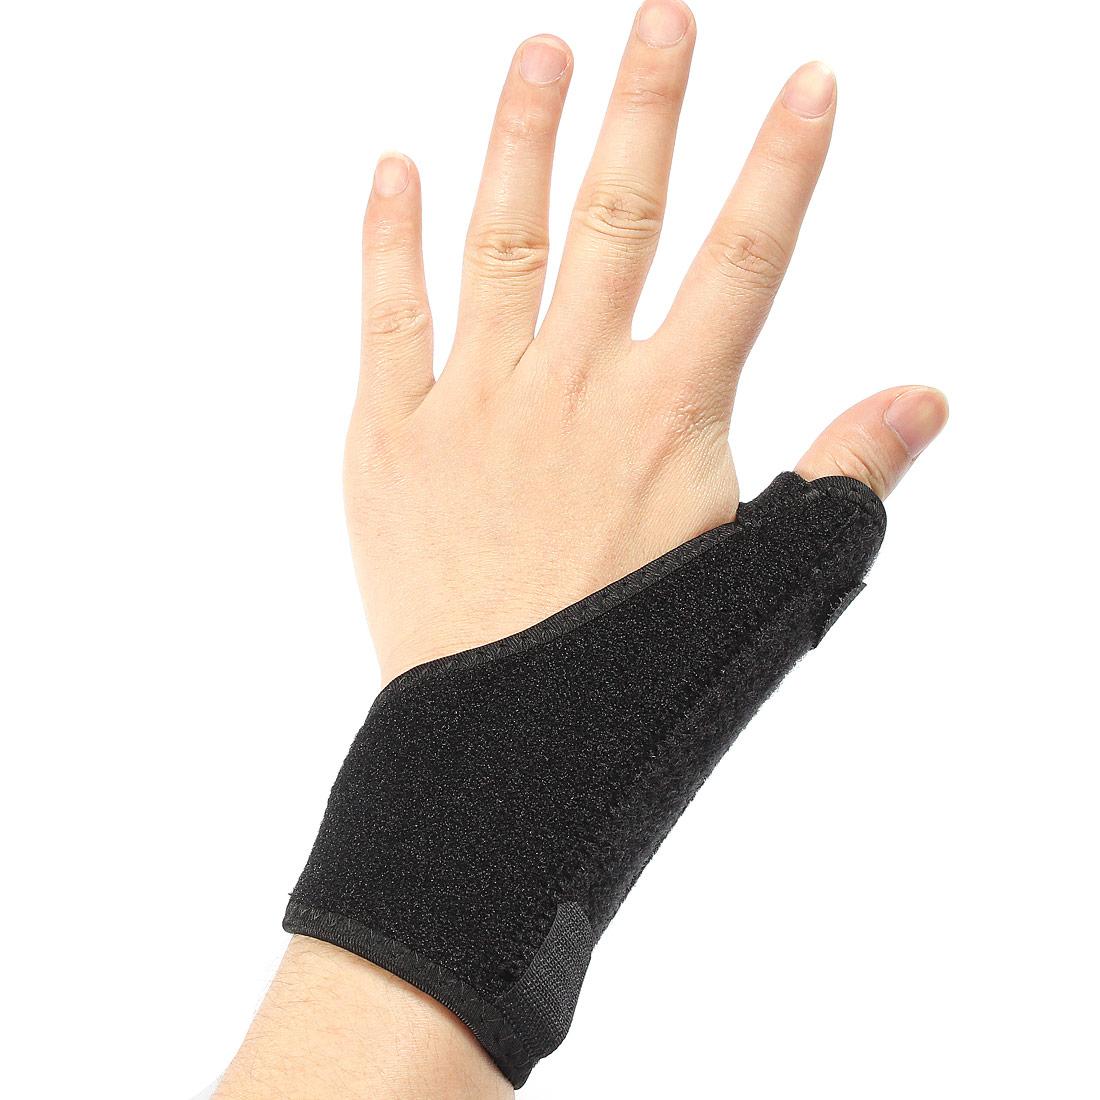 Buy Finger Wrist Support Unisex Sports Clothing Gloves ...